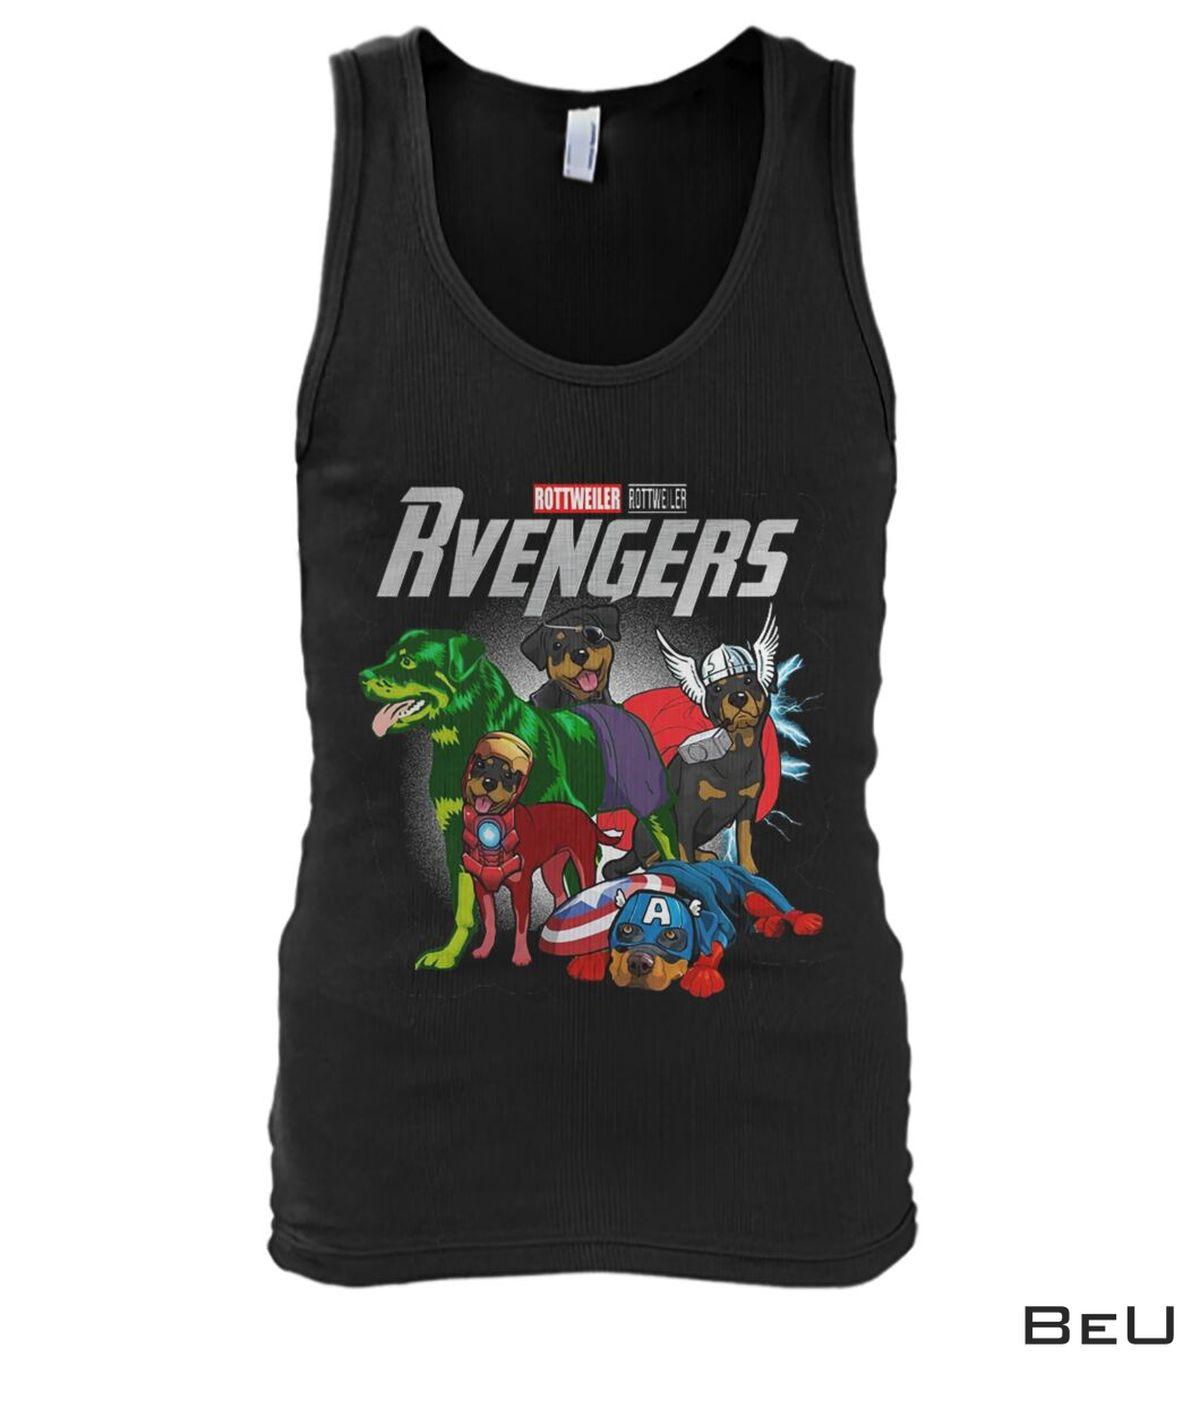 Rottweiler Rvengers Avengers Shirtx